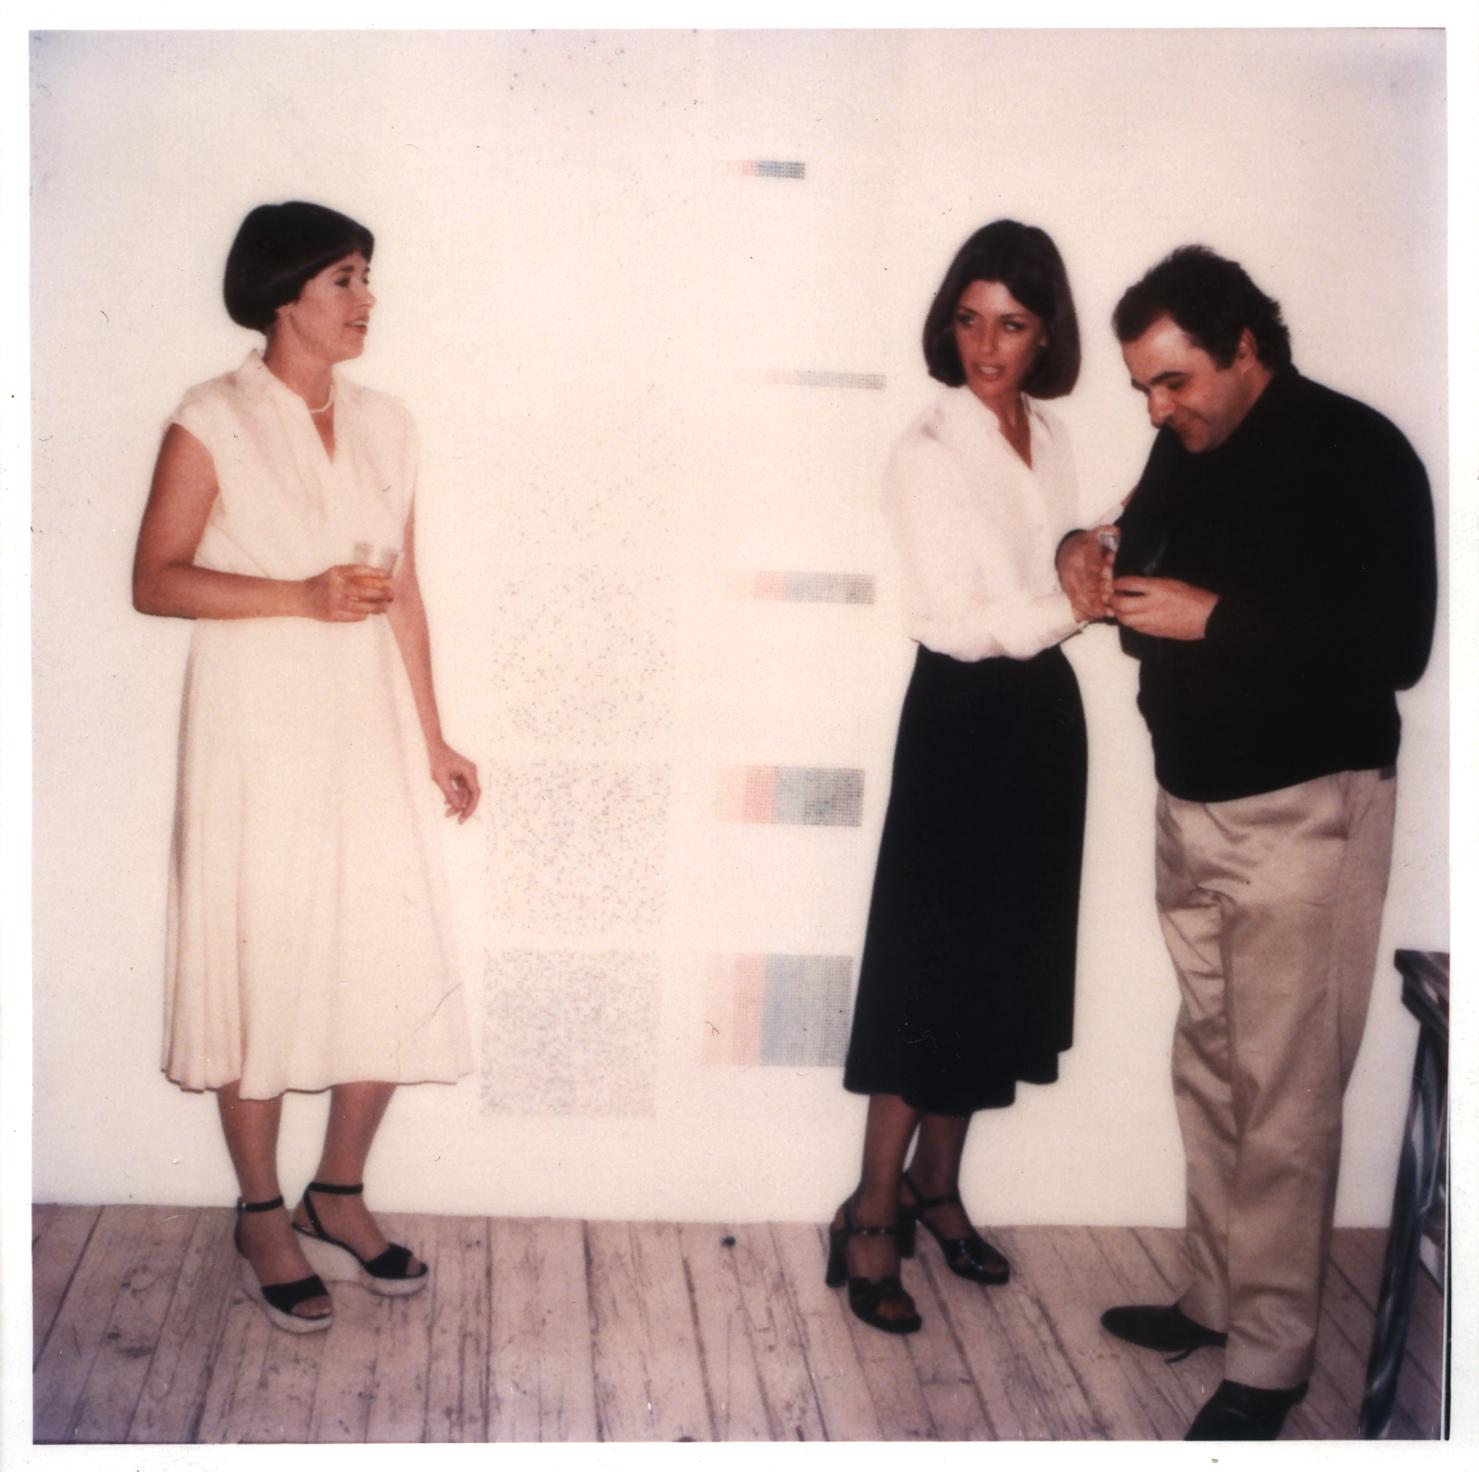 Jennifer Bartlett, Paula Cooper and Joel Shapiro at Paula Cooper's loft, circa 1980. Artwork on the wall by Jennifer Bartlett.